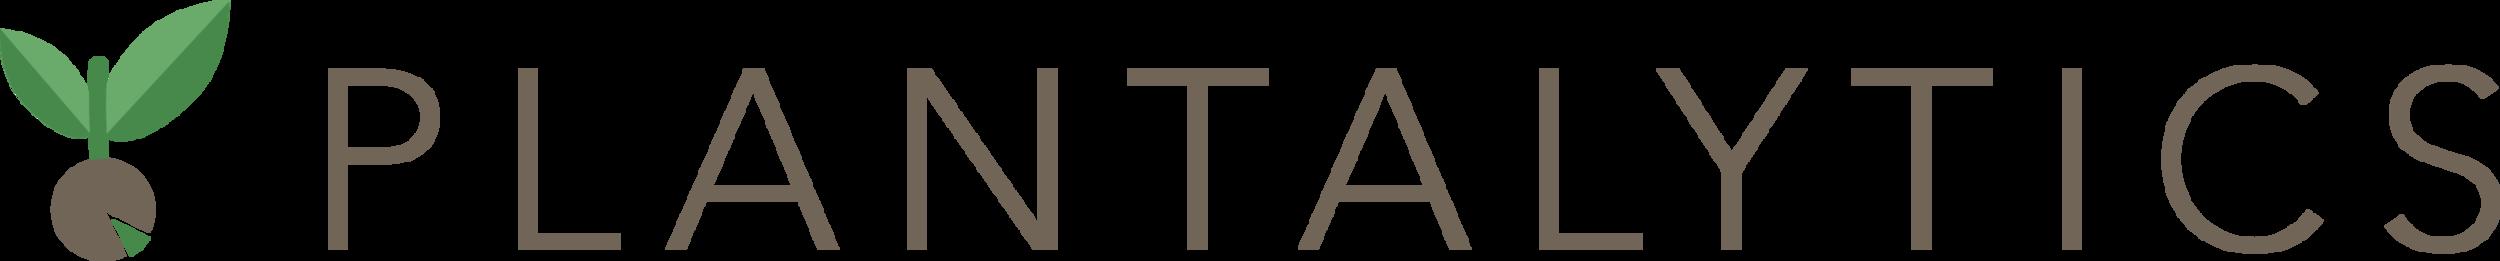 Plantalytics Logo.png